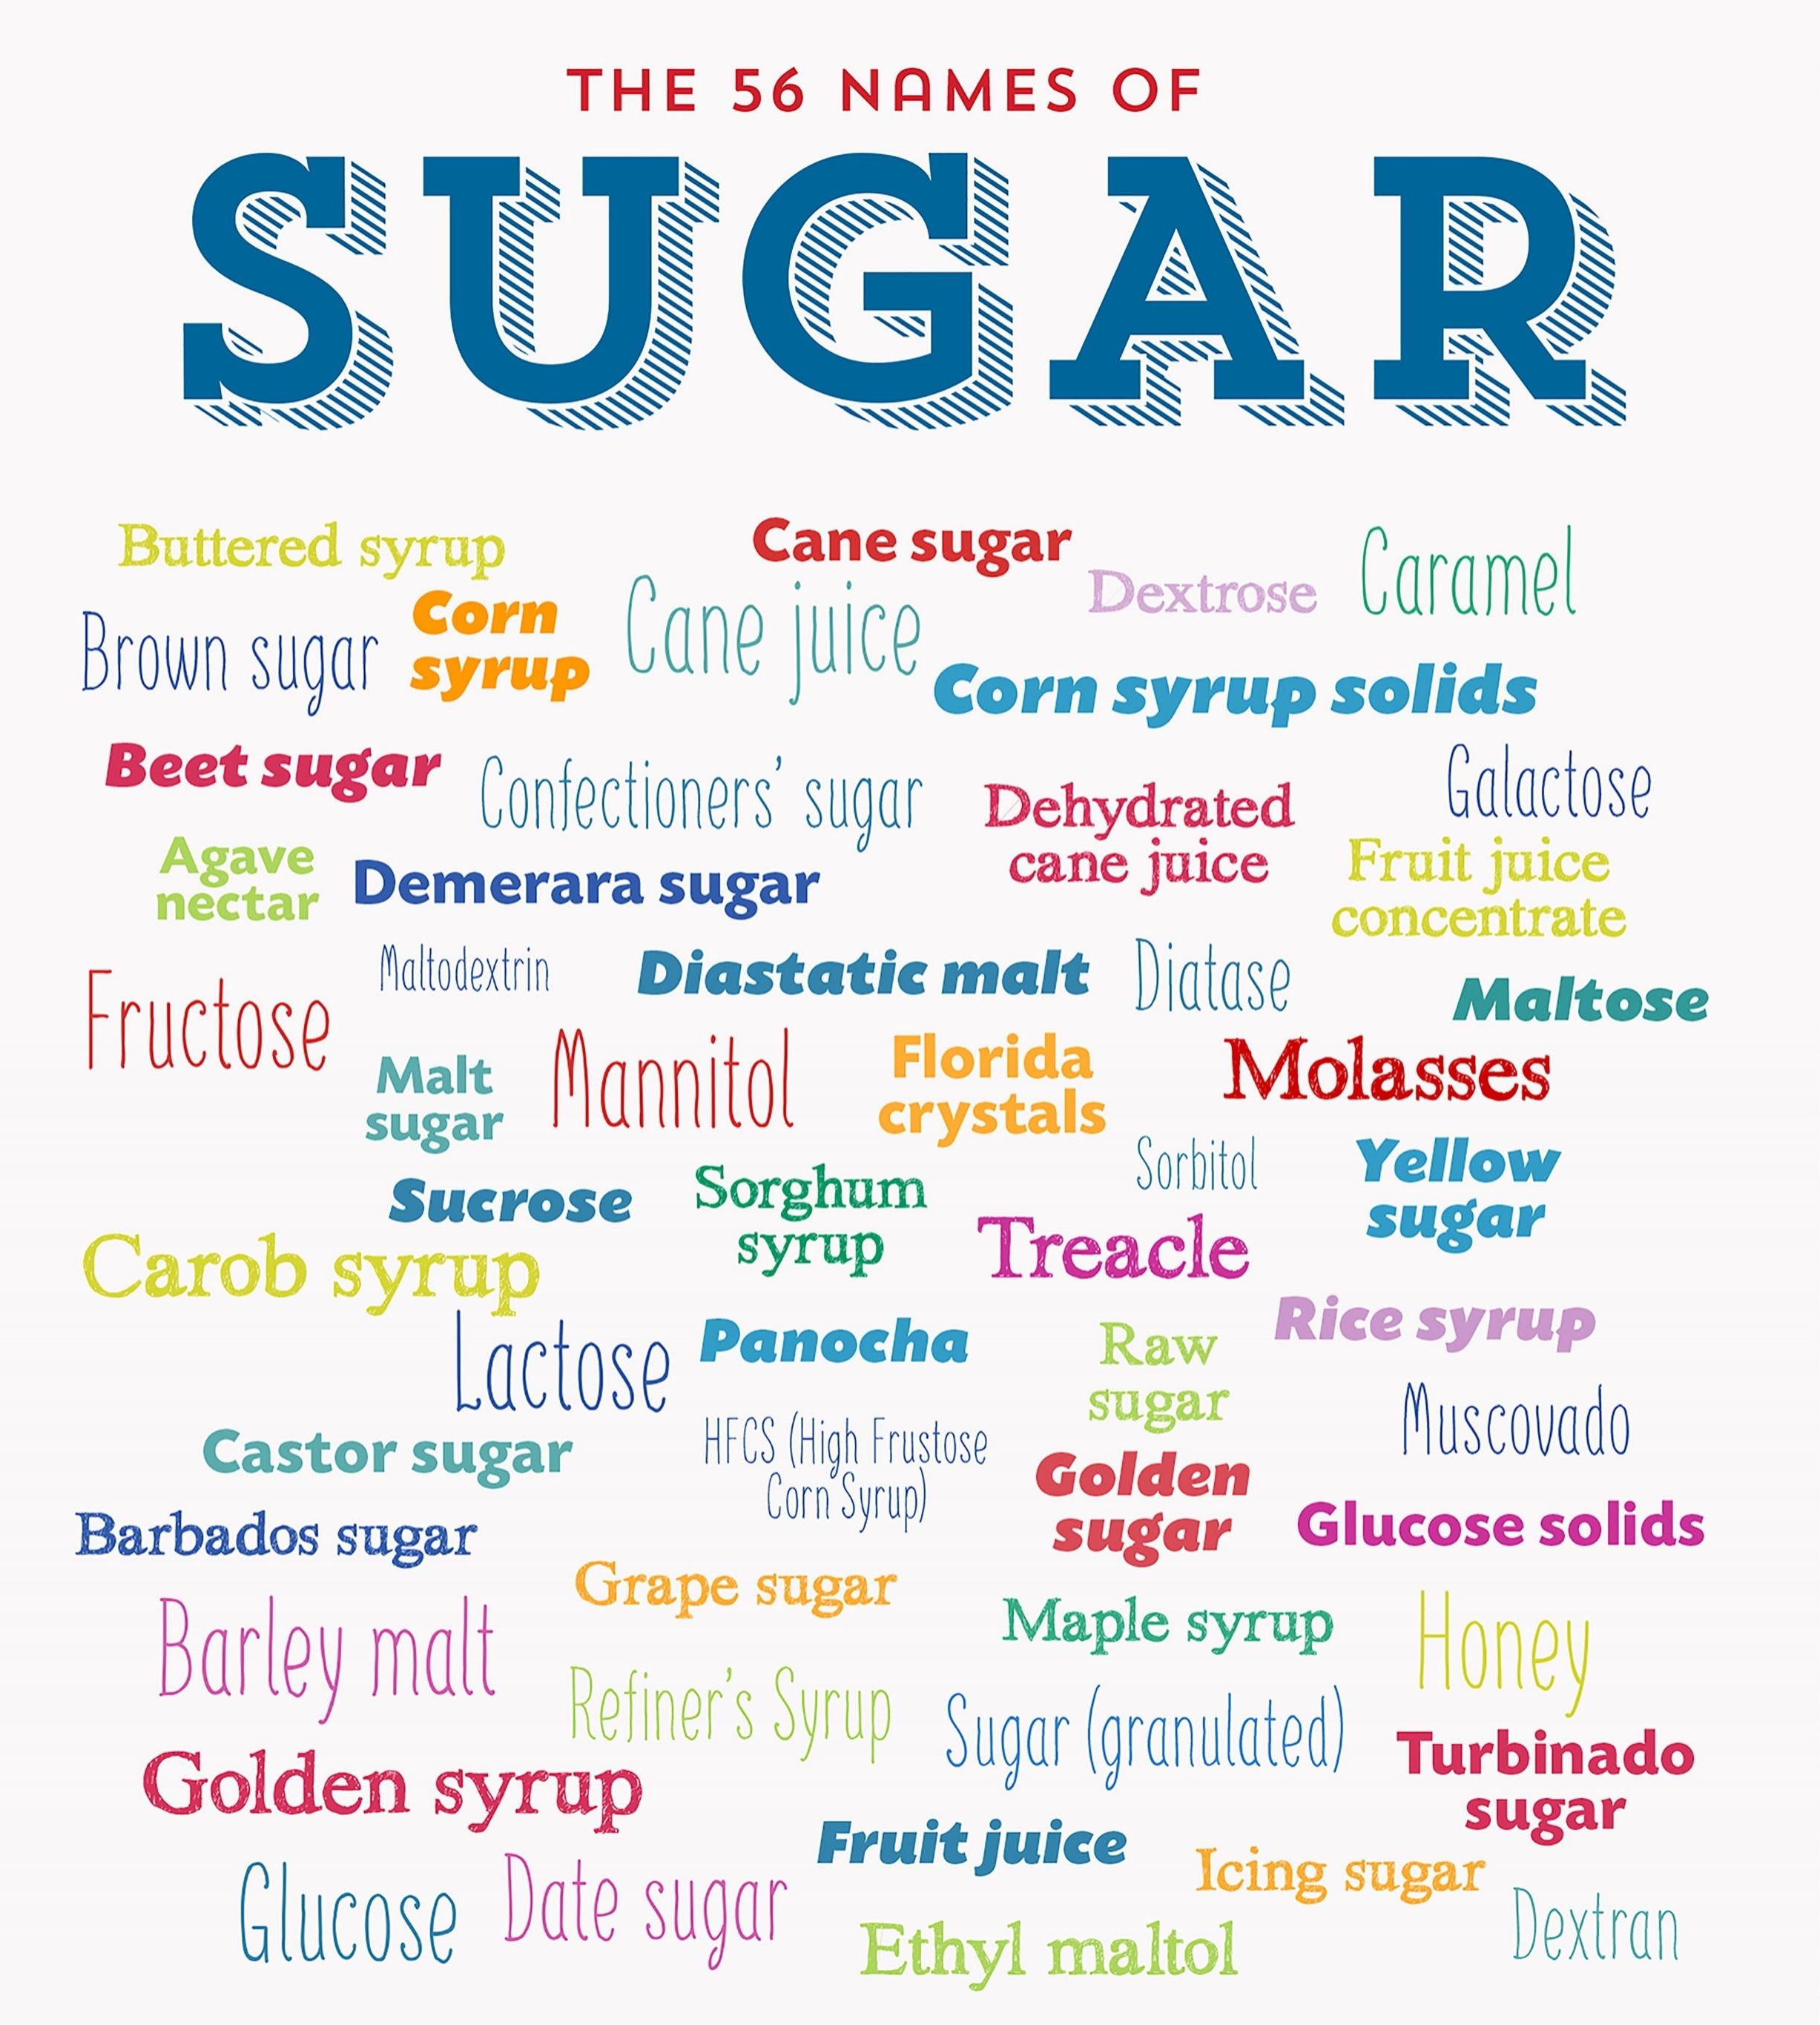 56 names for sugar.jpg